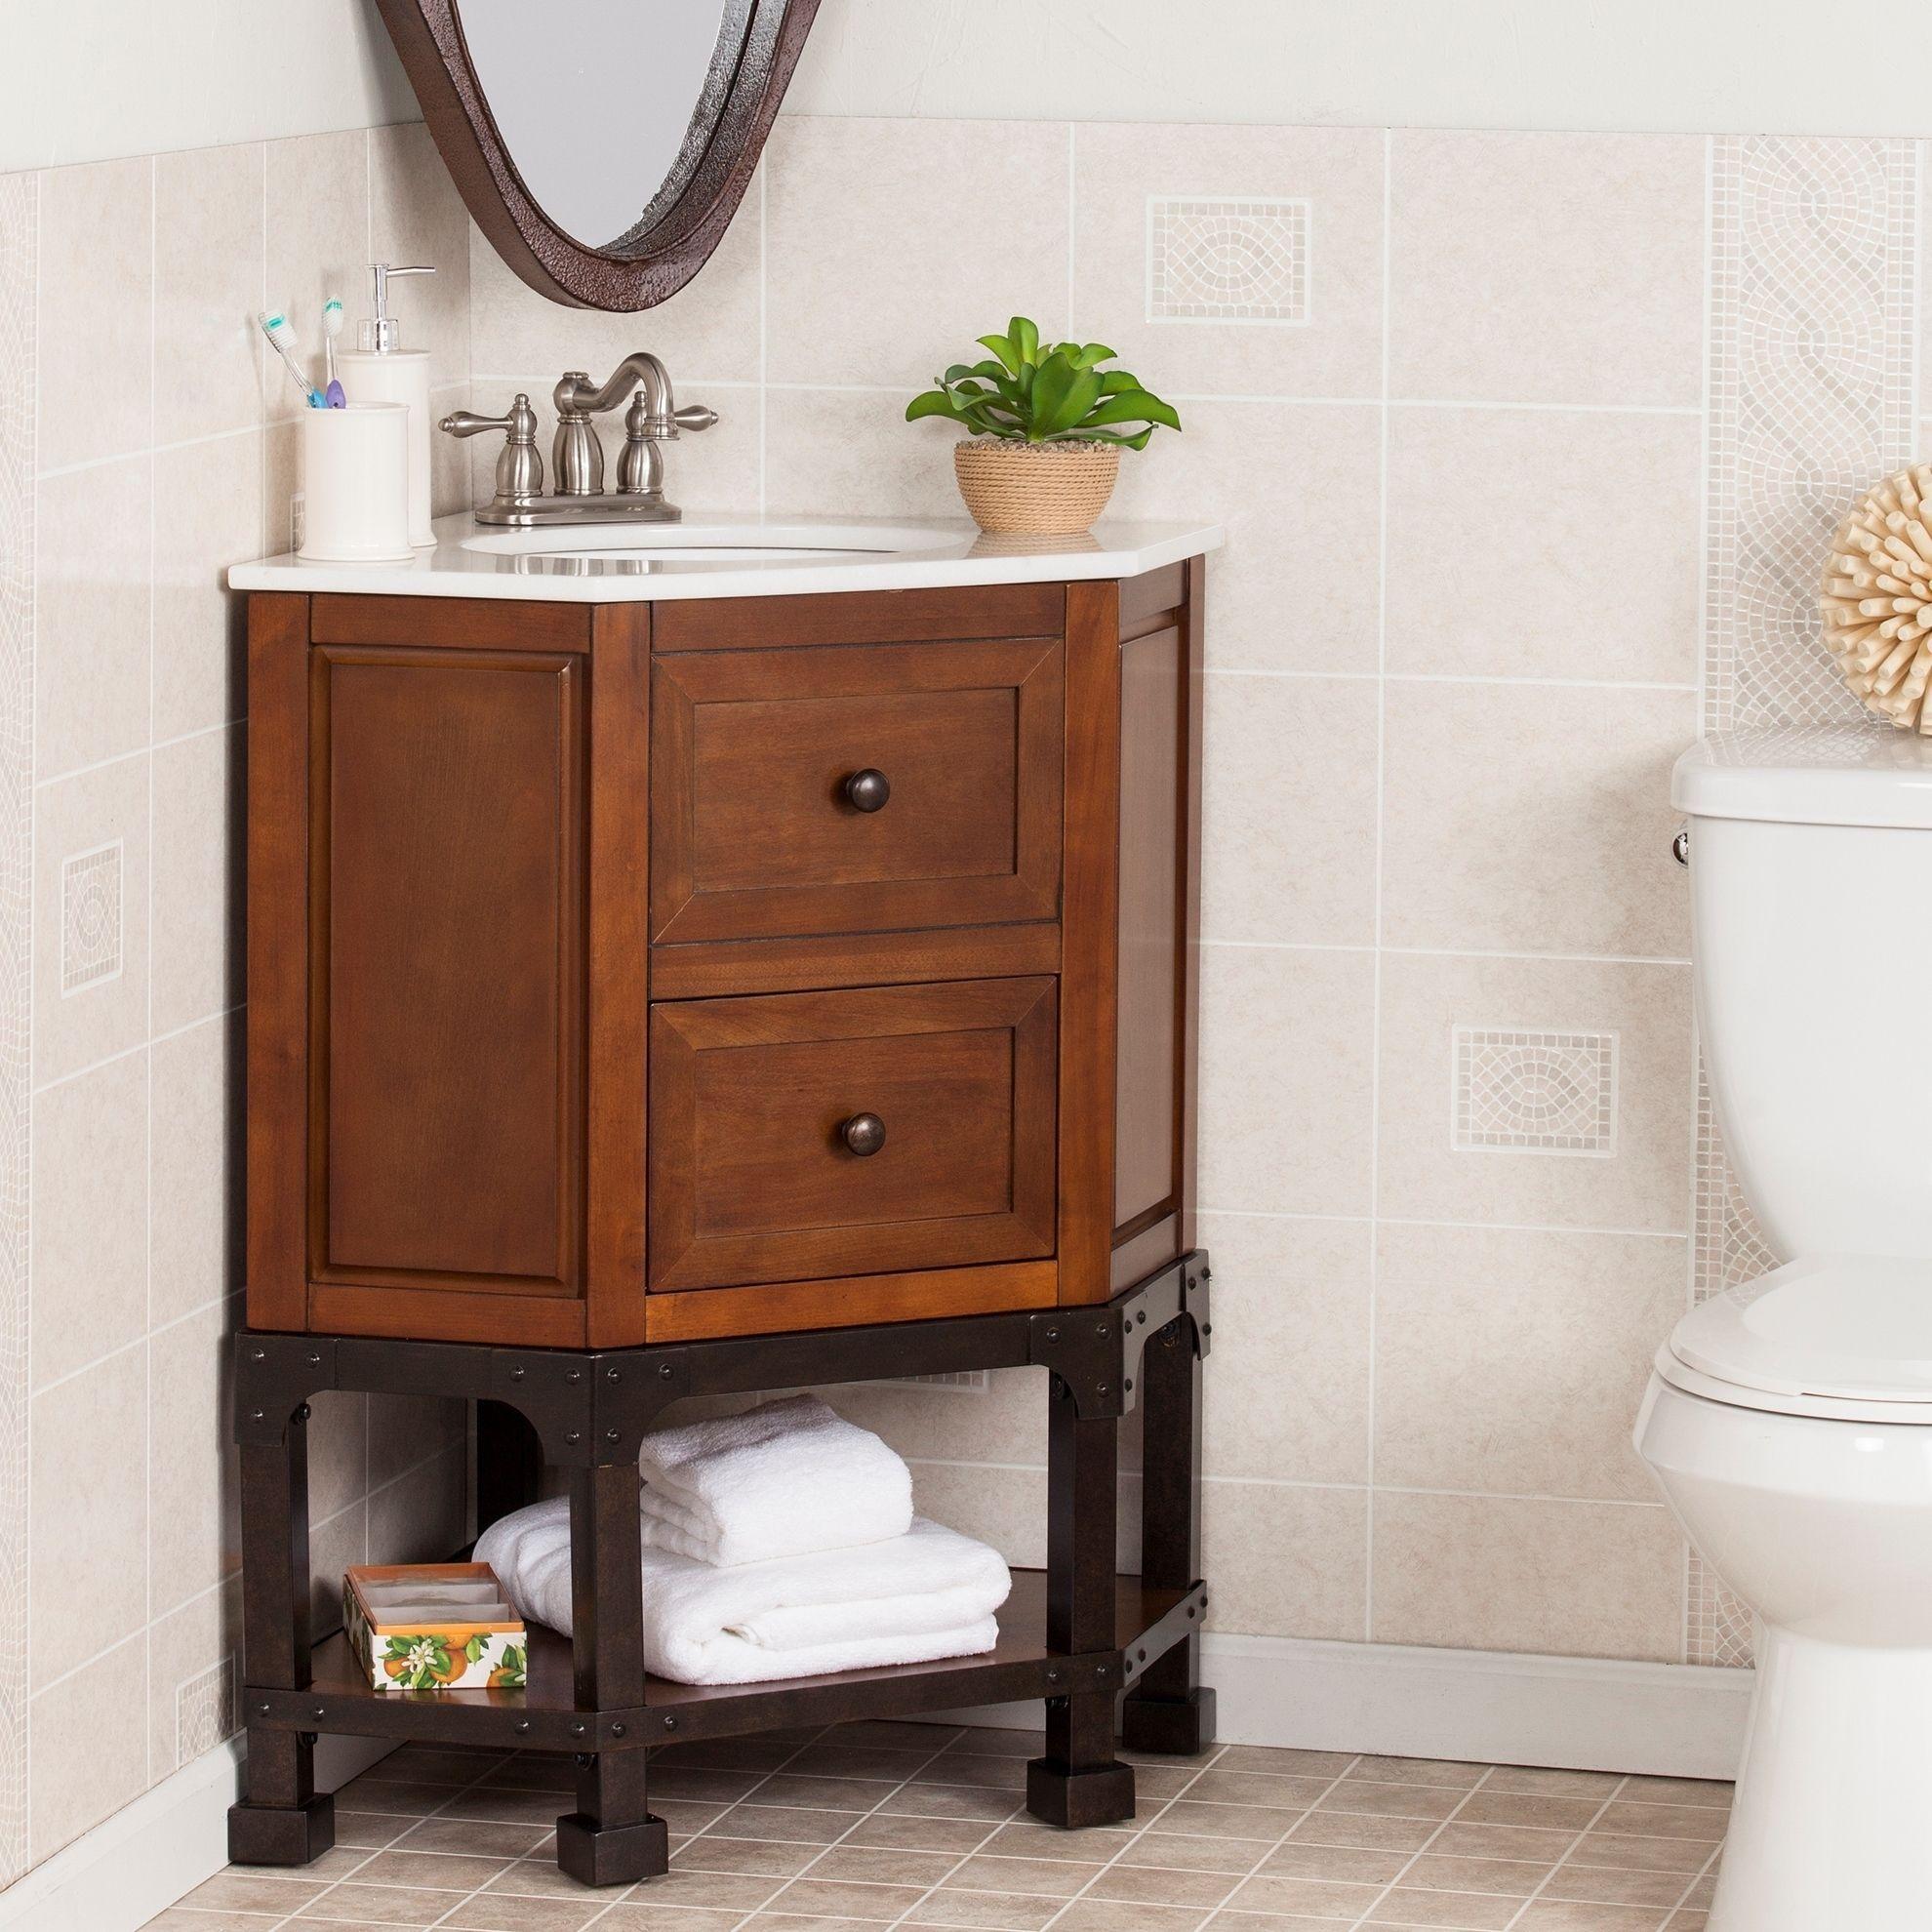 Harper Blvd Carmen Marble Top Corner Bath Vanity Sink (OS1787TB ...